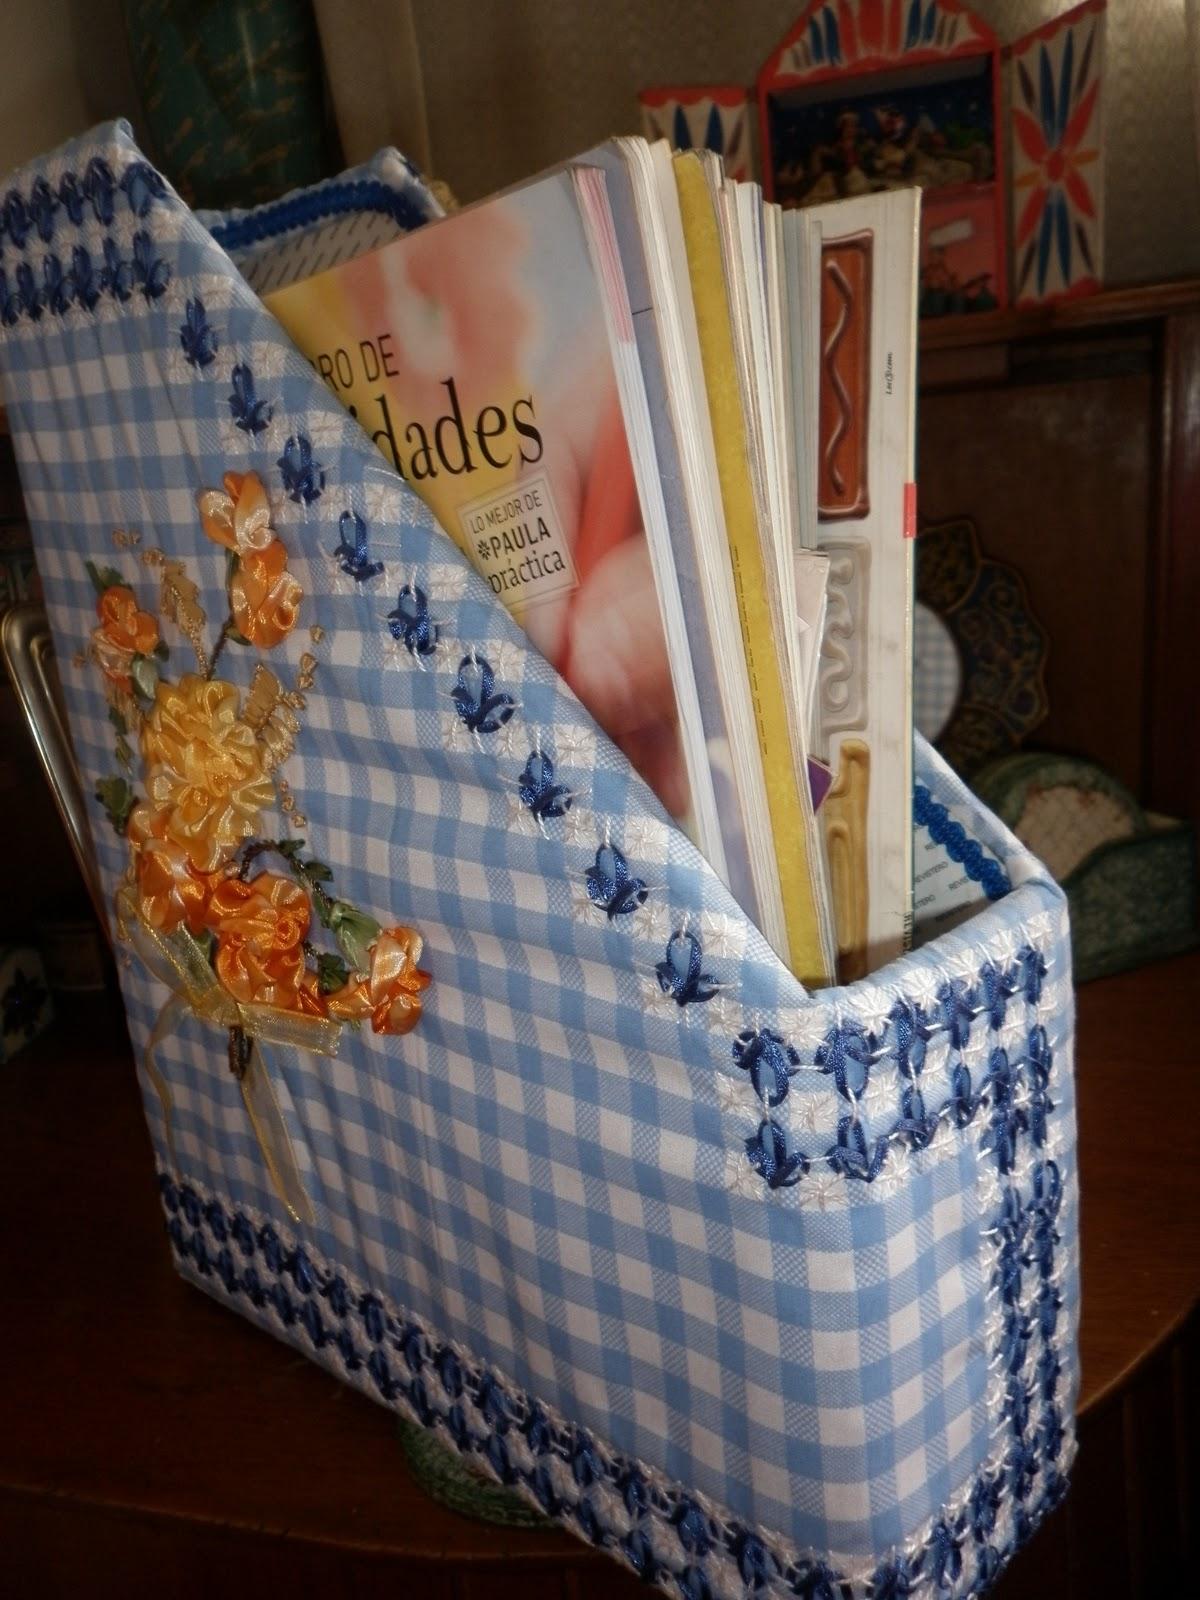 Manualidades para hacer en casa revistero con caja de cereal o de galletas - Cajas para manualidades ...